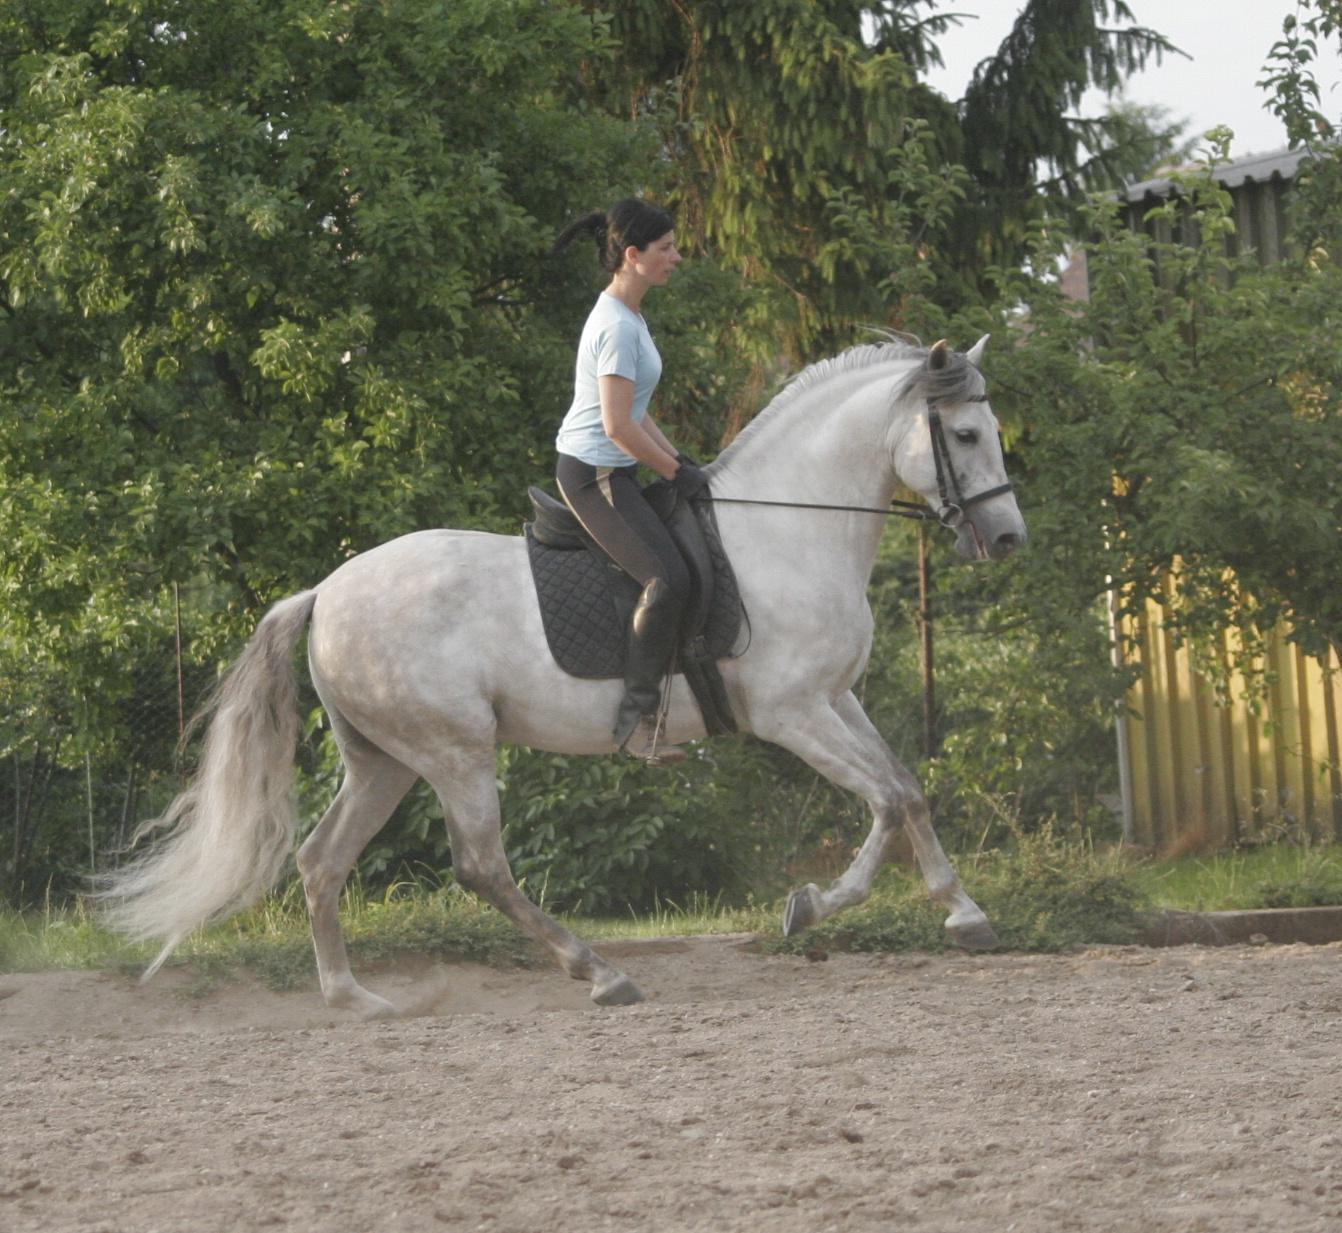 Jaleo PRE 11 y. (pic 2007)